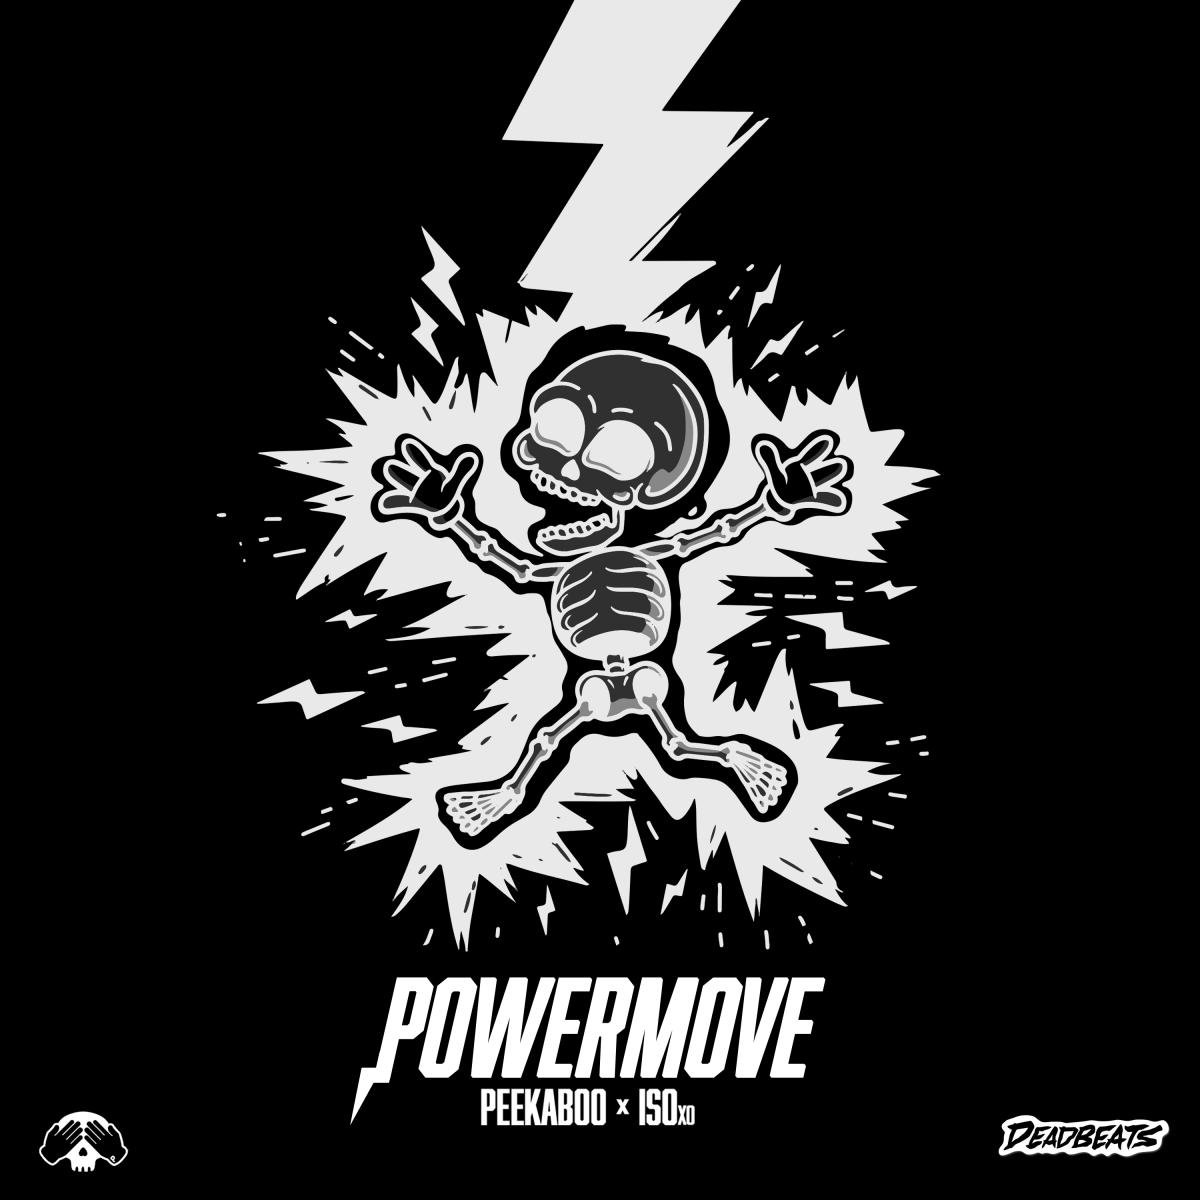 Peekaboo_Powermove